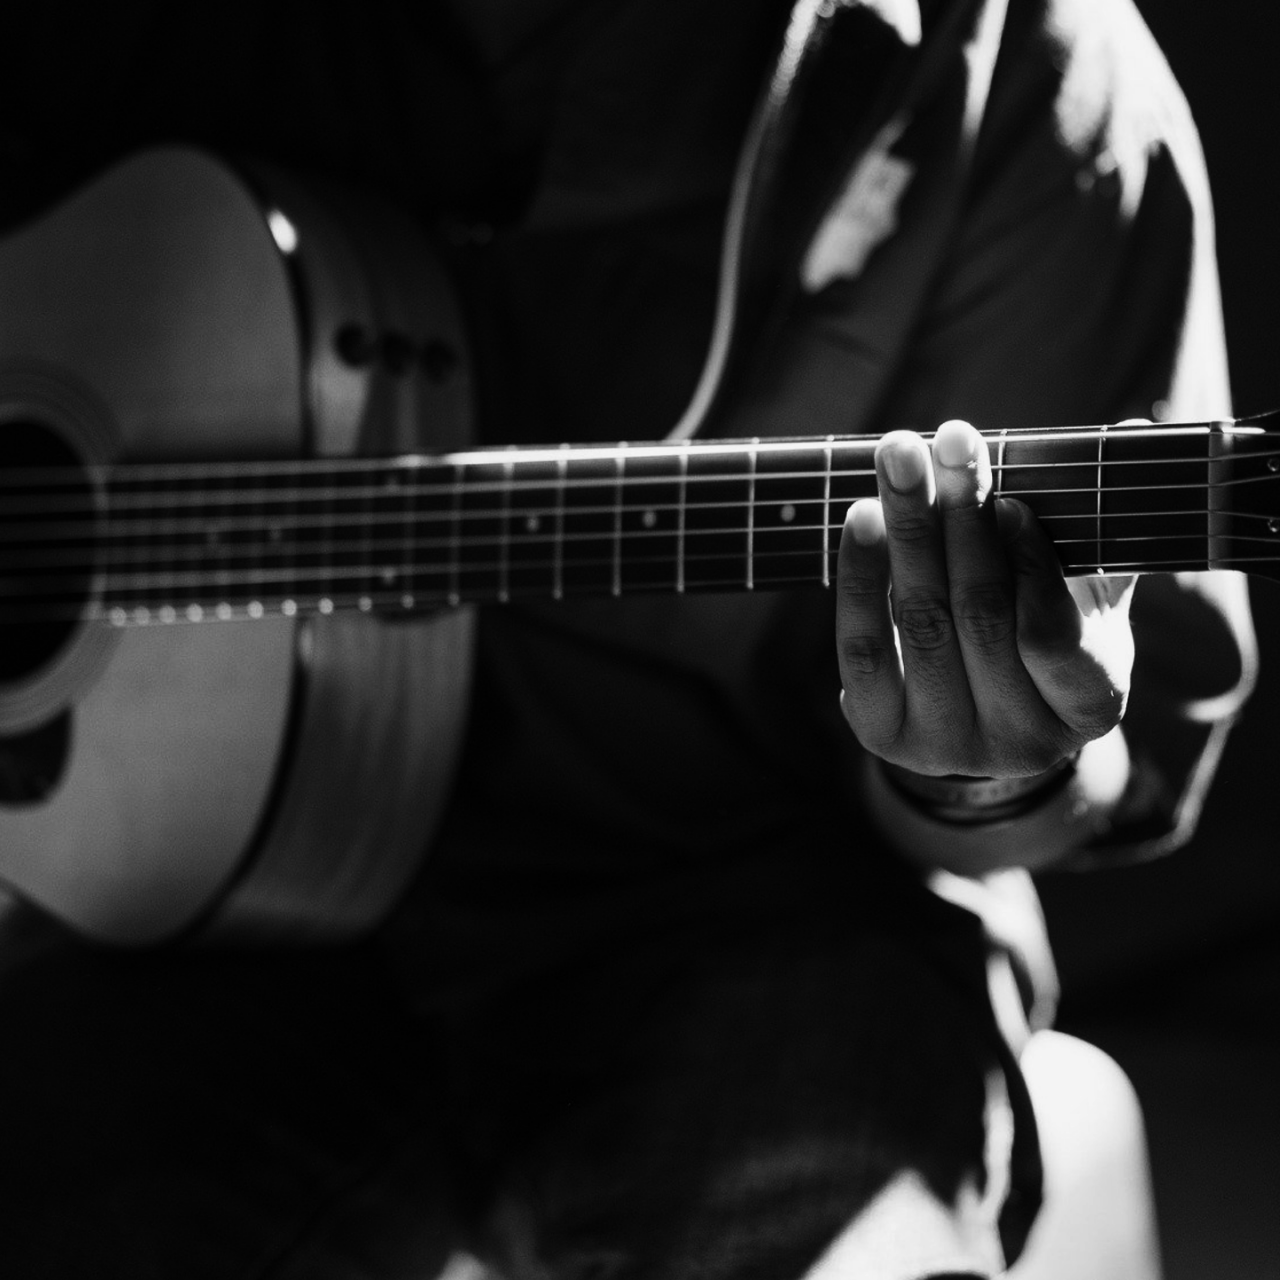 http://dublinschoolofmusic.ie/wp-content/uploads/2019/11/acustic-guitar-1280x1280.png